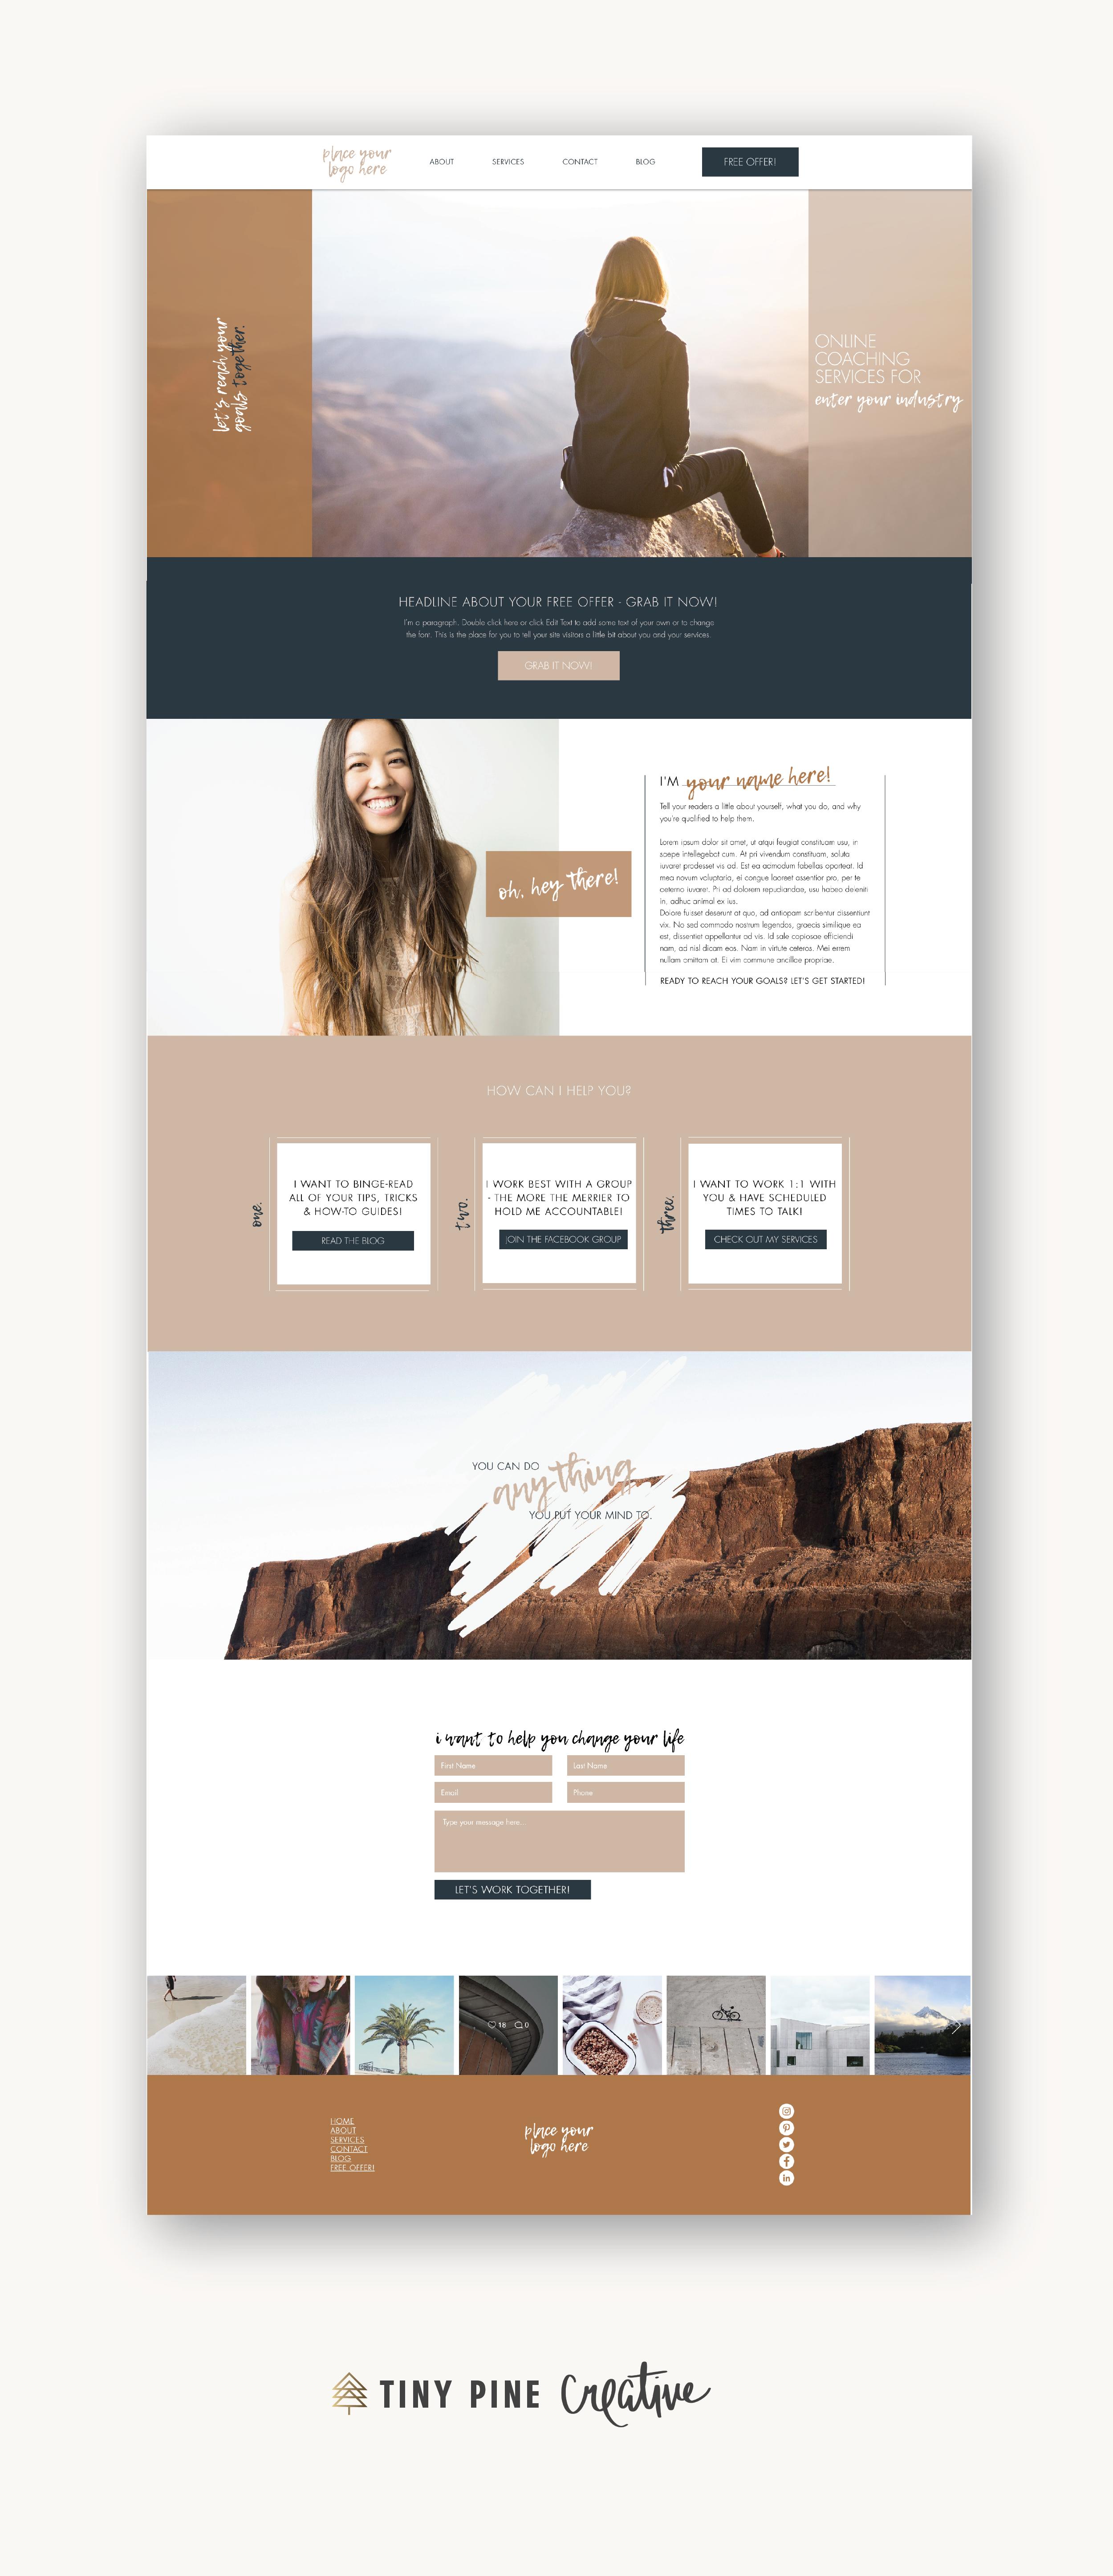 Desert Wix Website Template Tiny Pine Creative In 2020 Wix Website Templates Small Business Website Design Wix Templates